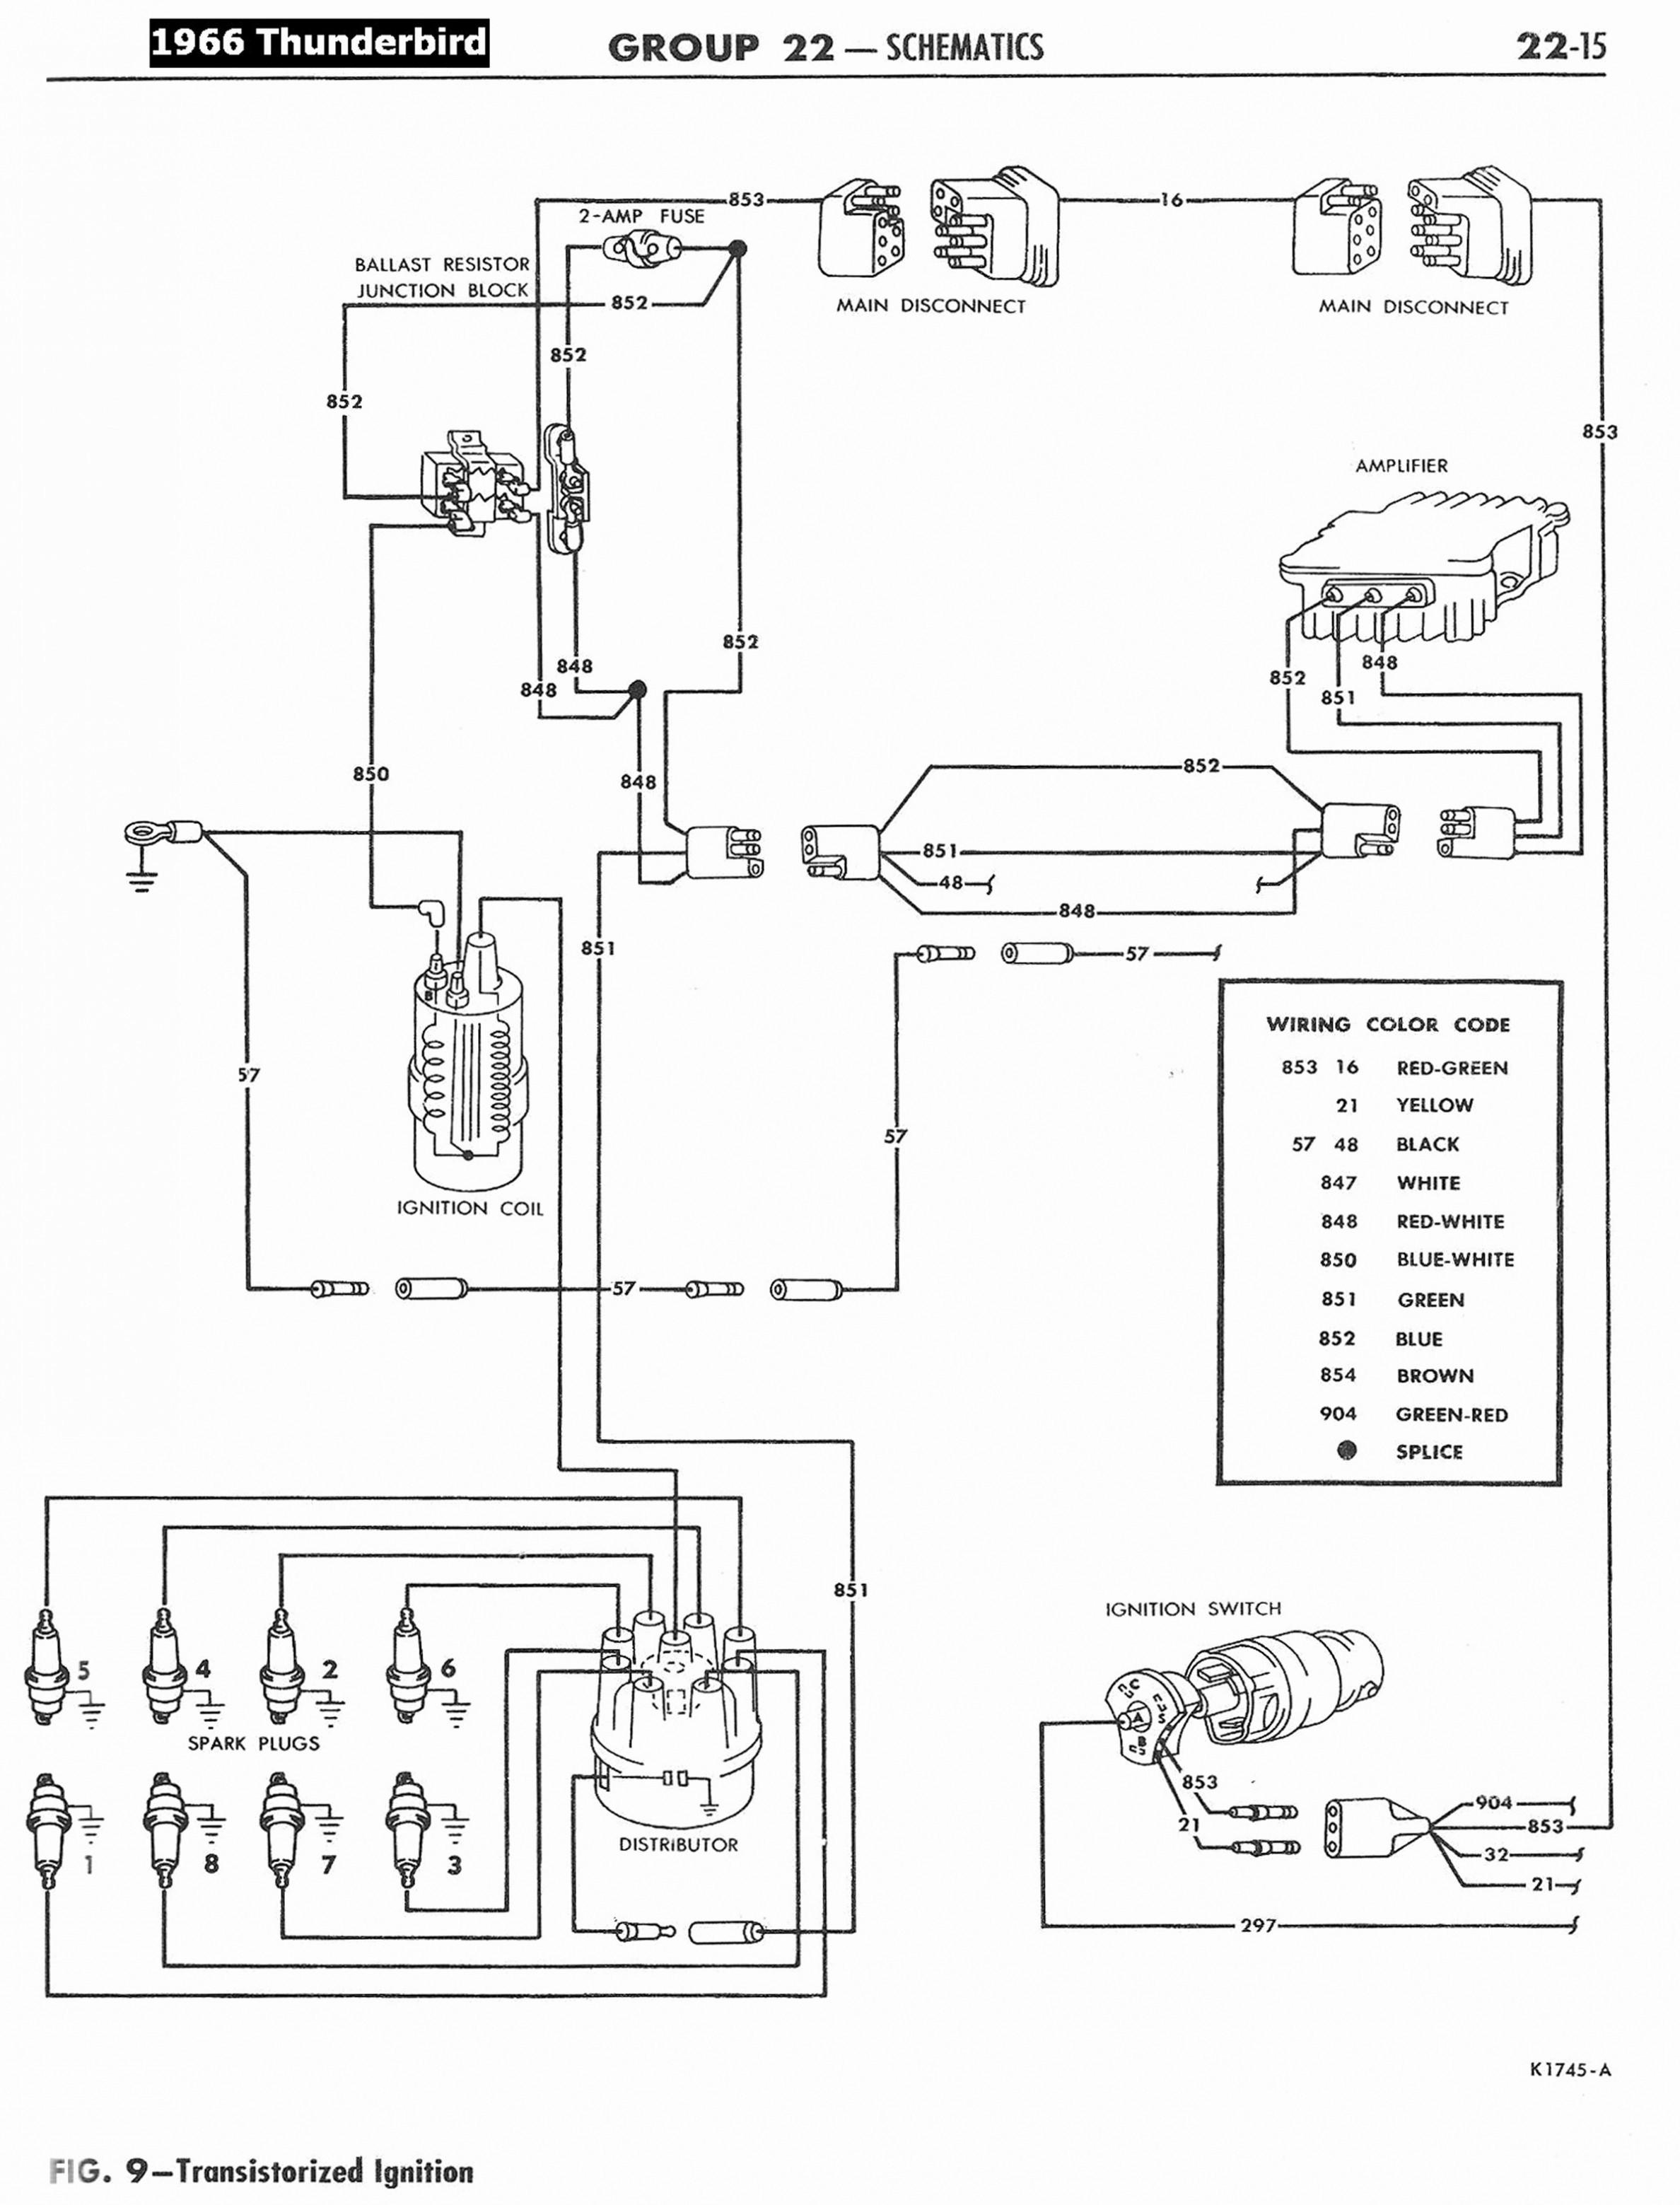 2001 Honda Civic Engine Diagram Honda C70 Wiring Diagram S Valid New Wiring Diagram Honda Civic Of 2001 Honda Civic Engine Diagram